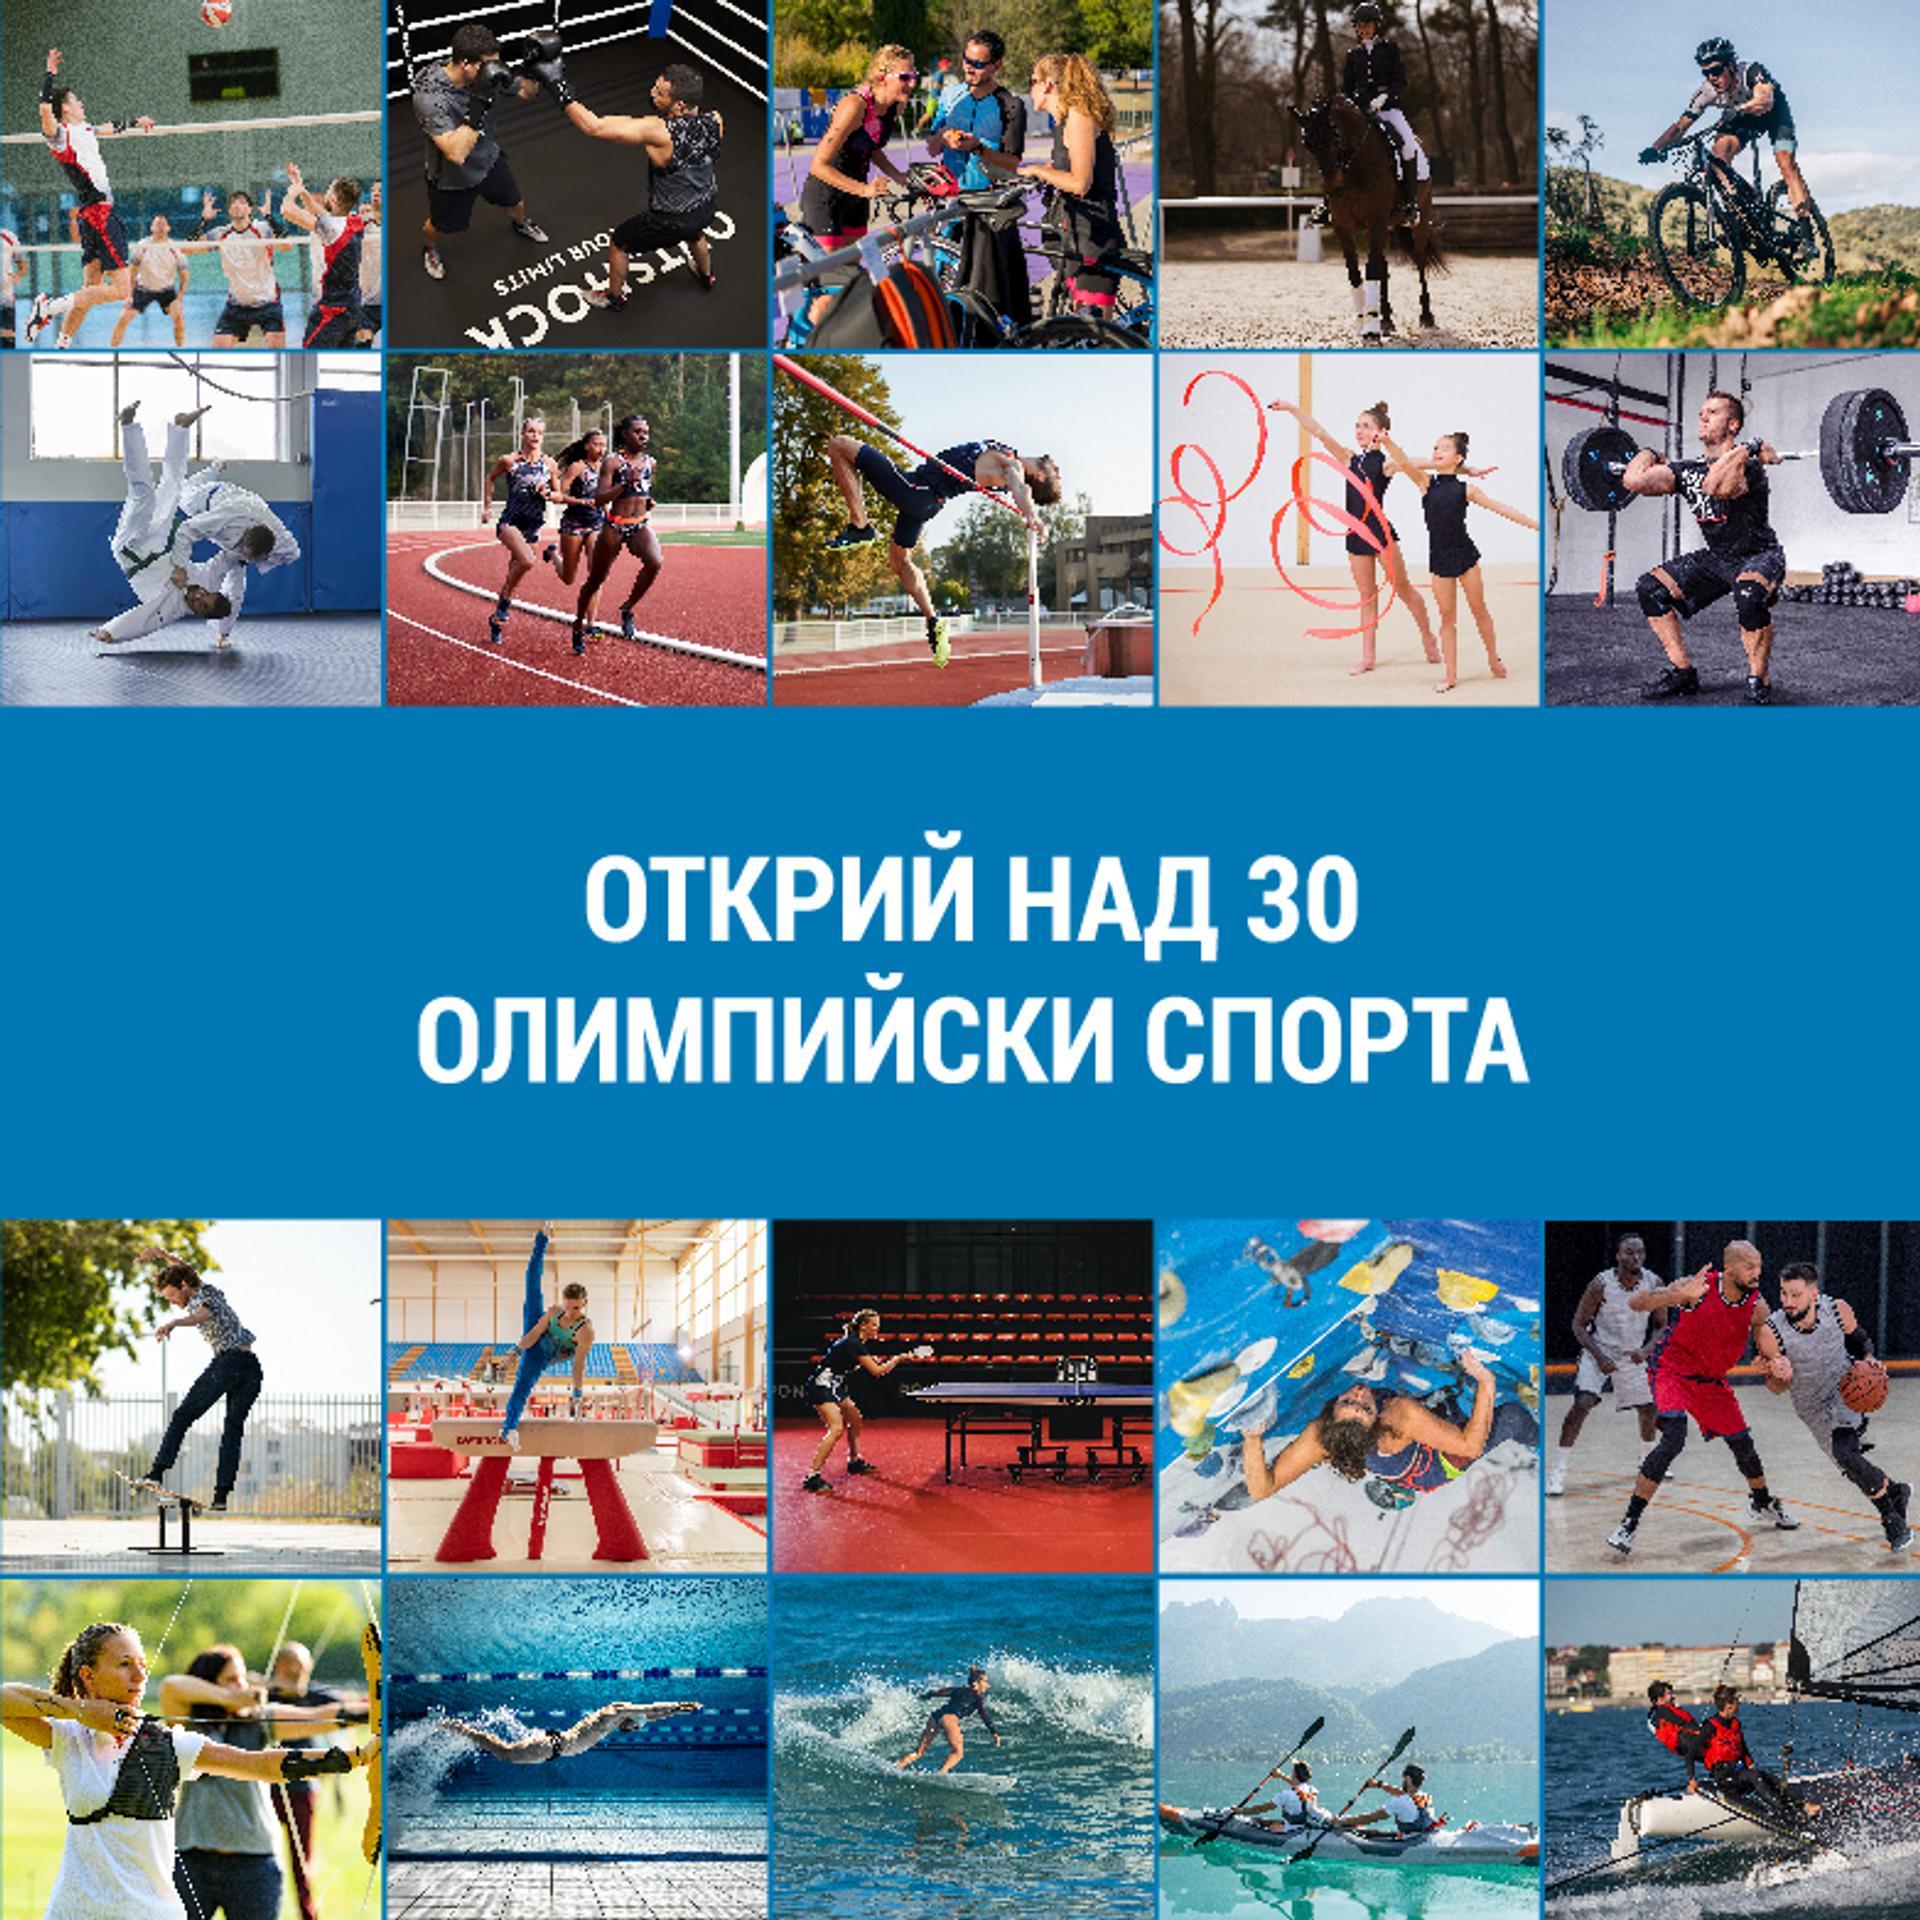 375x375px_olimpics-72ppi.jpg